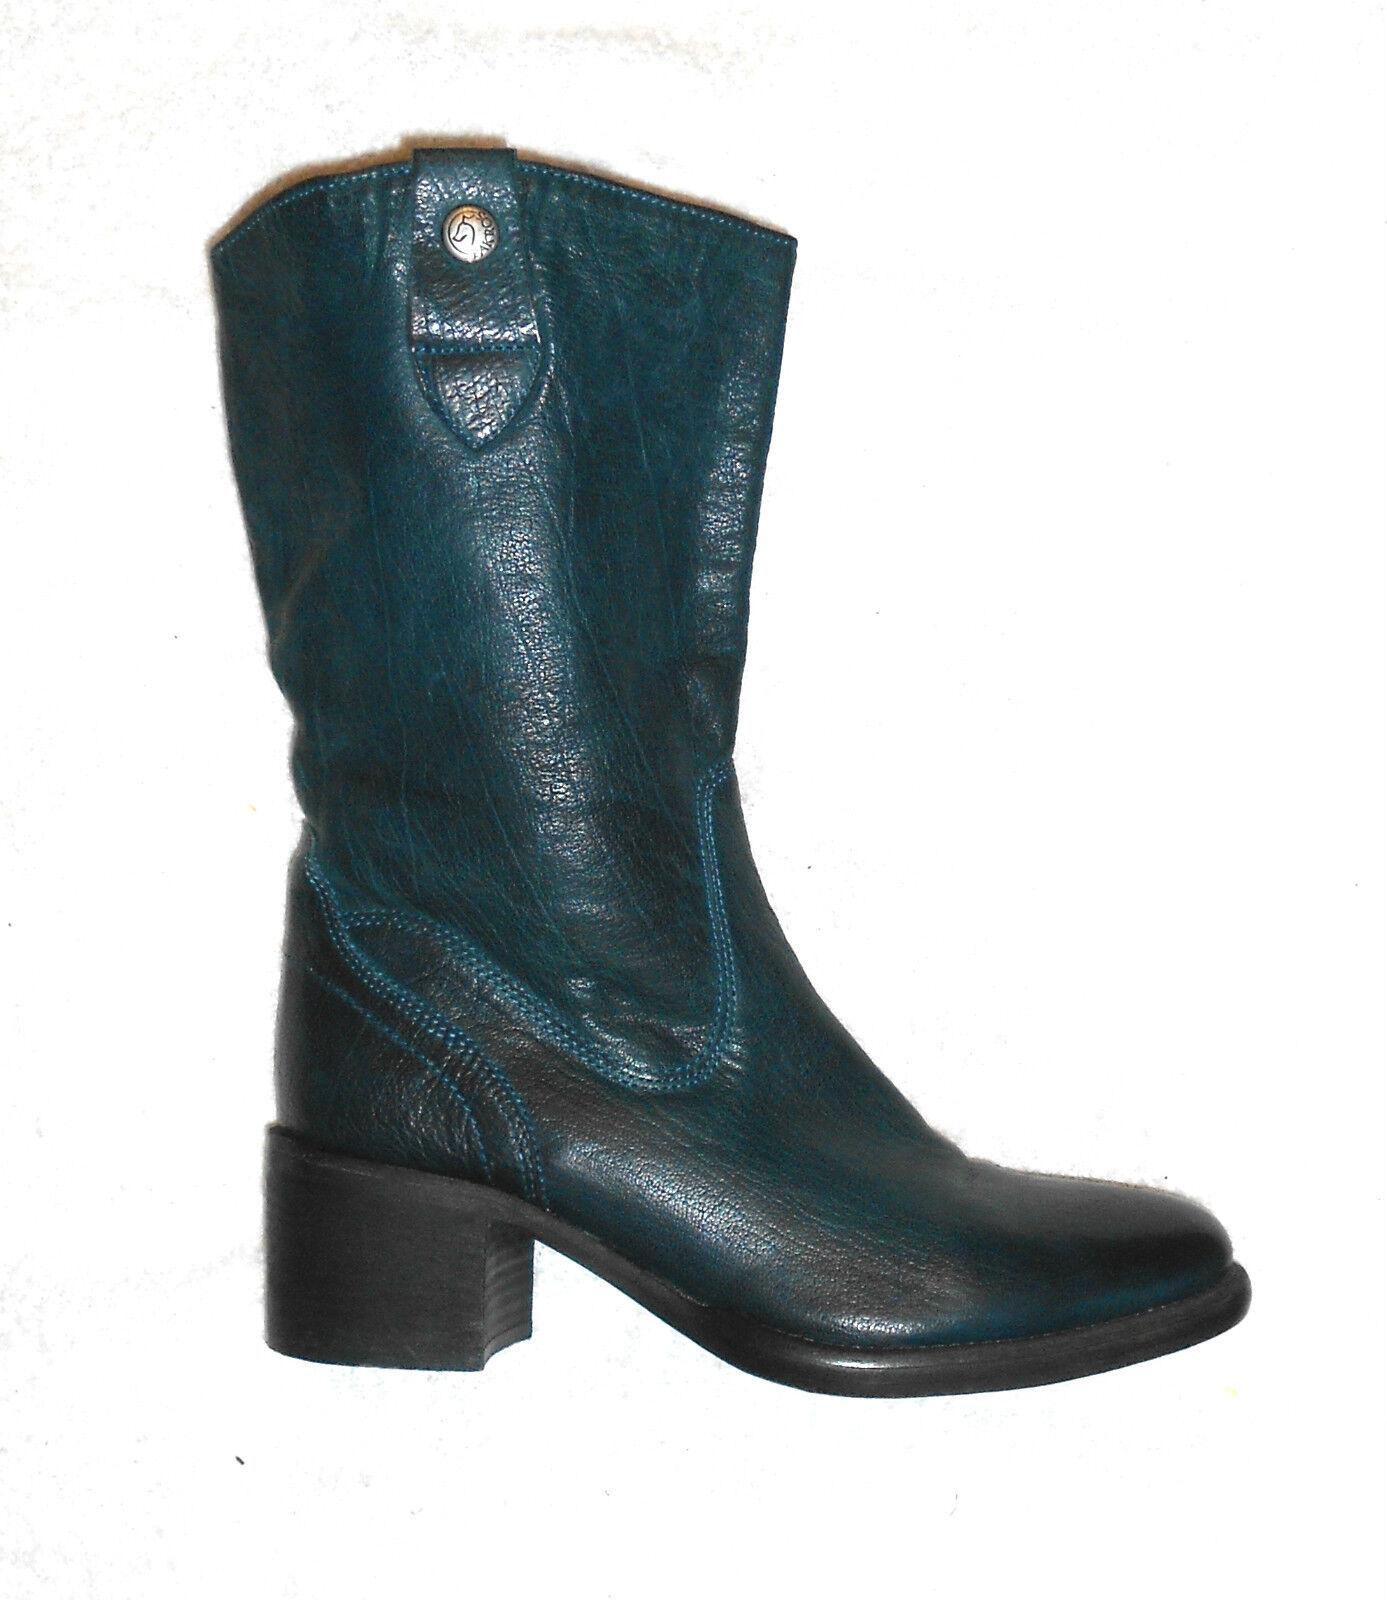 PAKROS bottes  zippées cuir bleu pétrole P 41 TBE